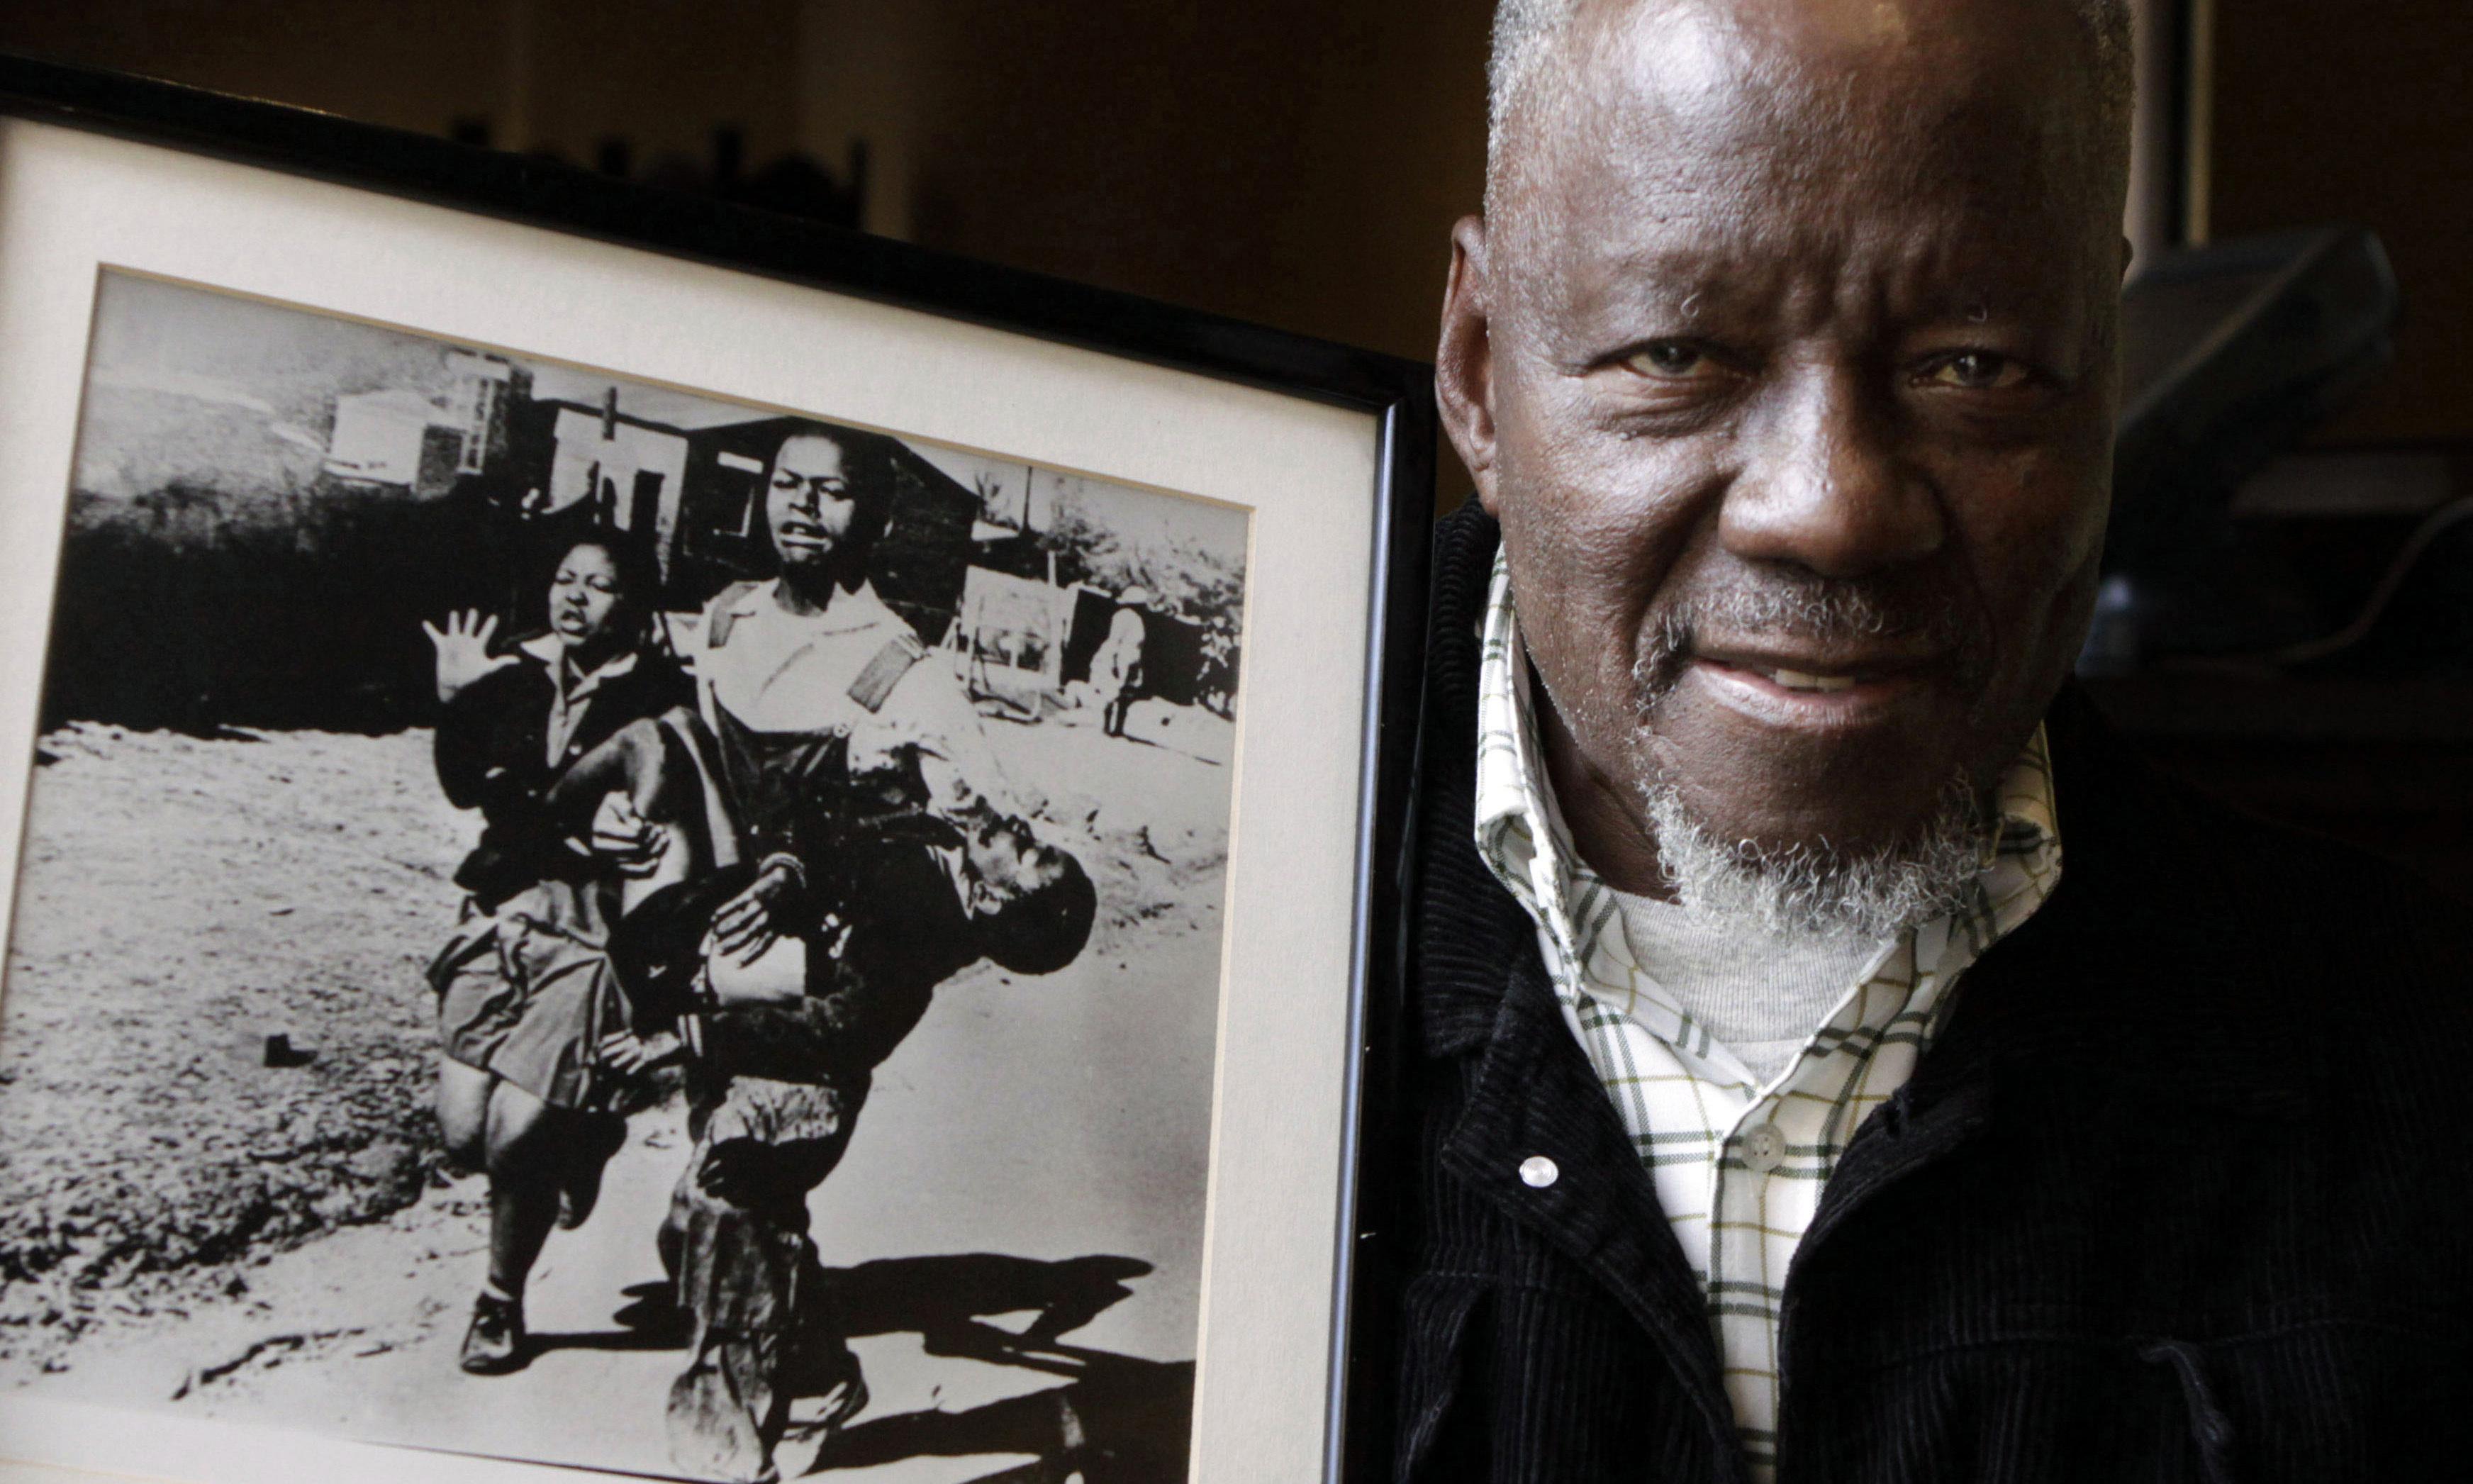 South African photographer Sam Nzima dies aged 83